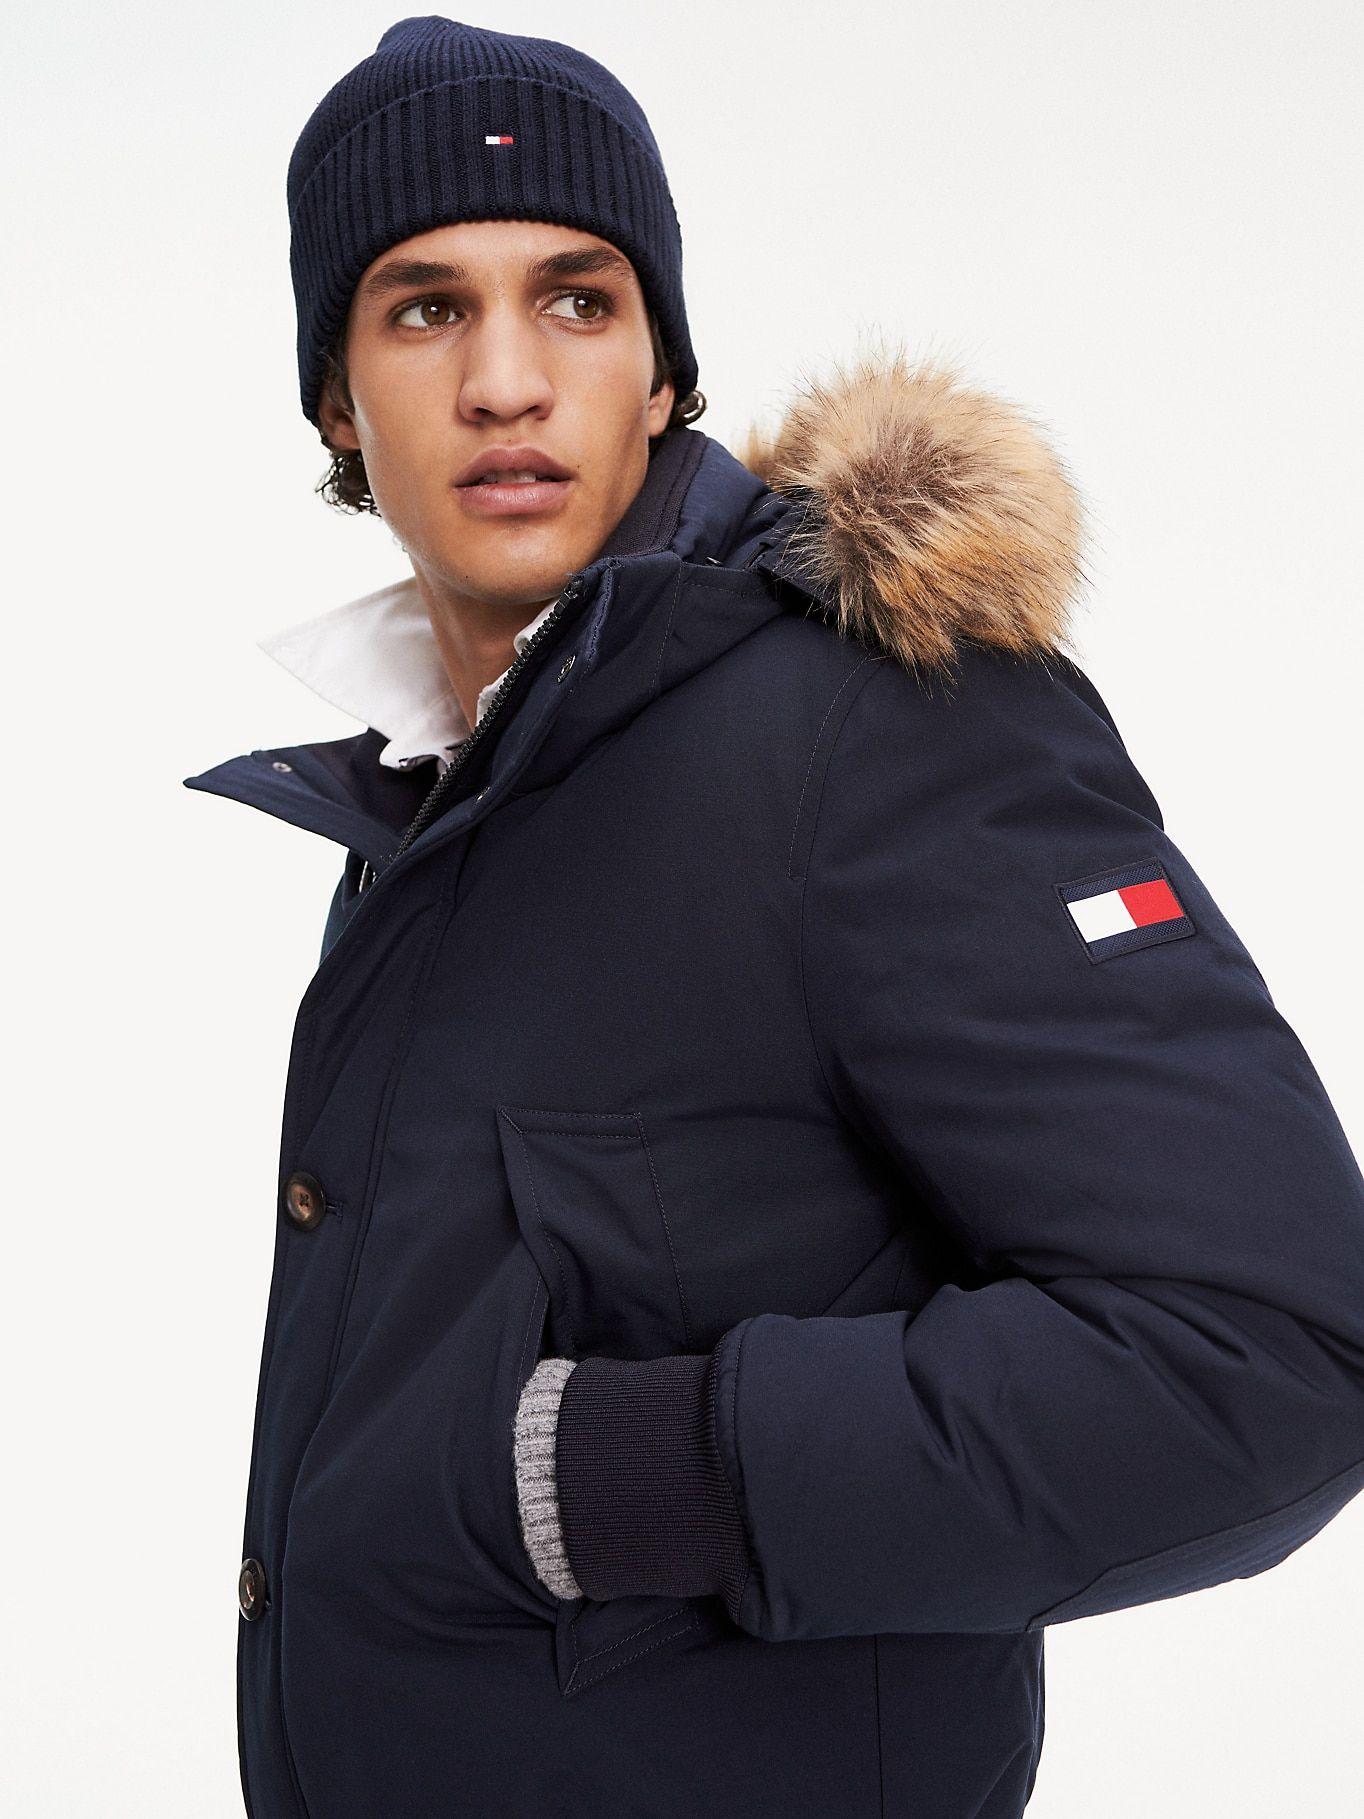 Down Filled Hooded Bomber Jacket Sky Captain Tommy Hilfiger Hooded Bomber Jacket Outerwear Jackets Men S Coats Jackets [ 1819 x 1364 Pixel ]